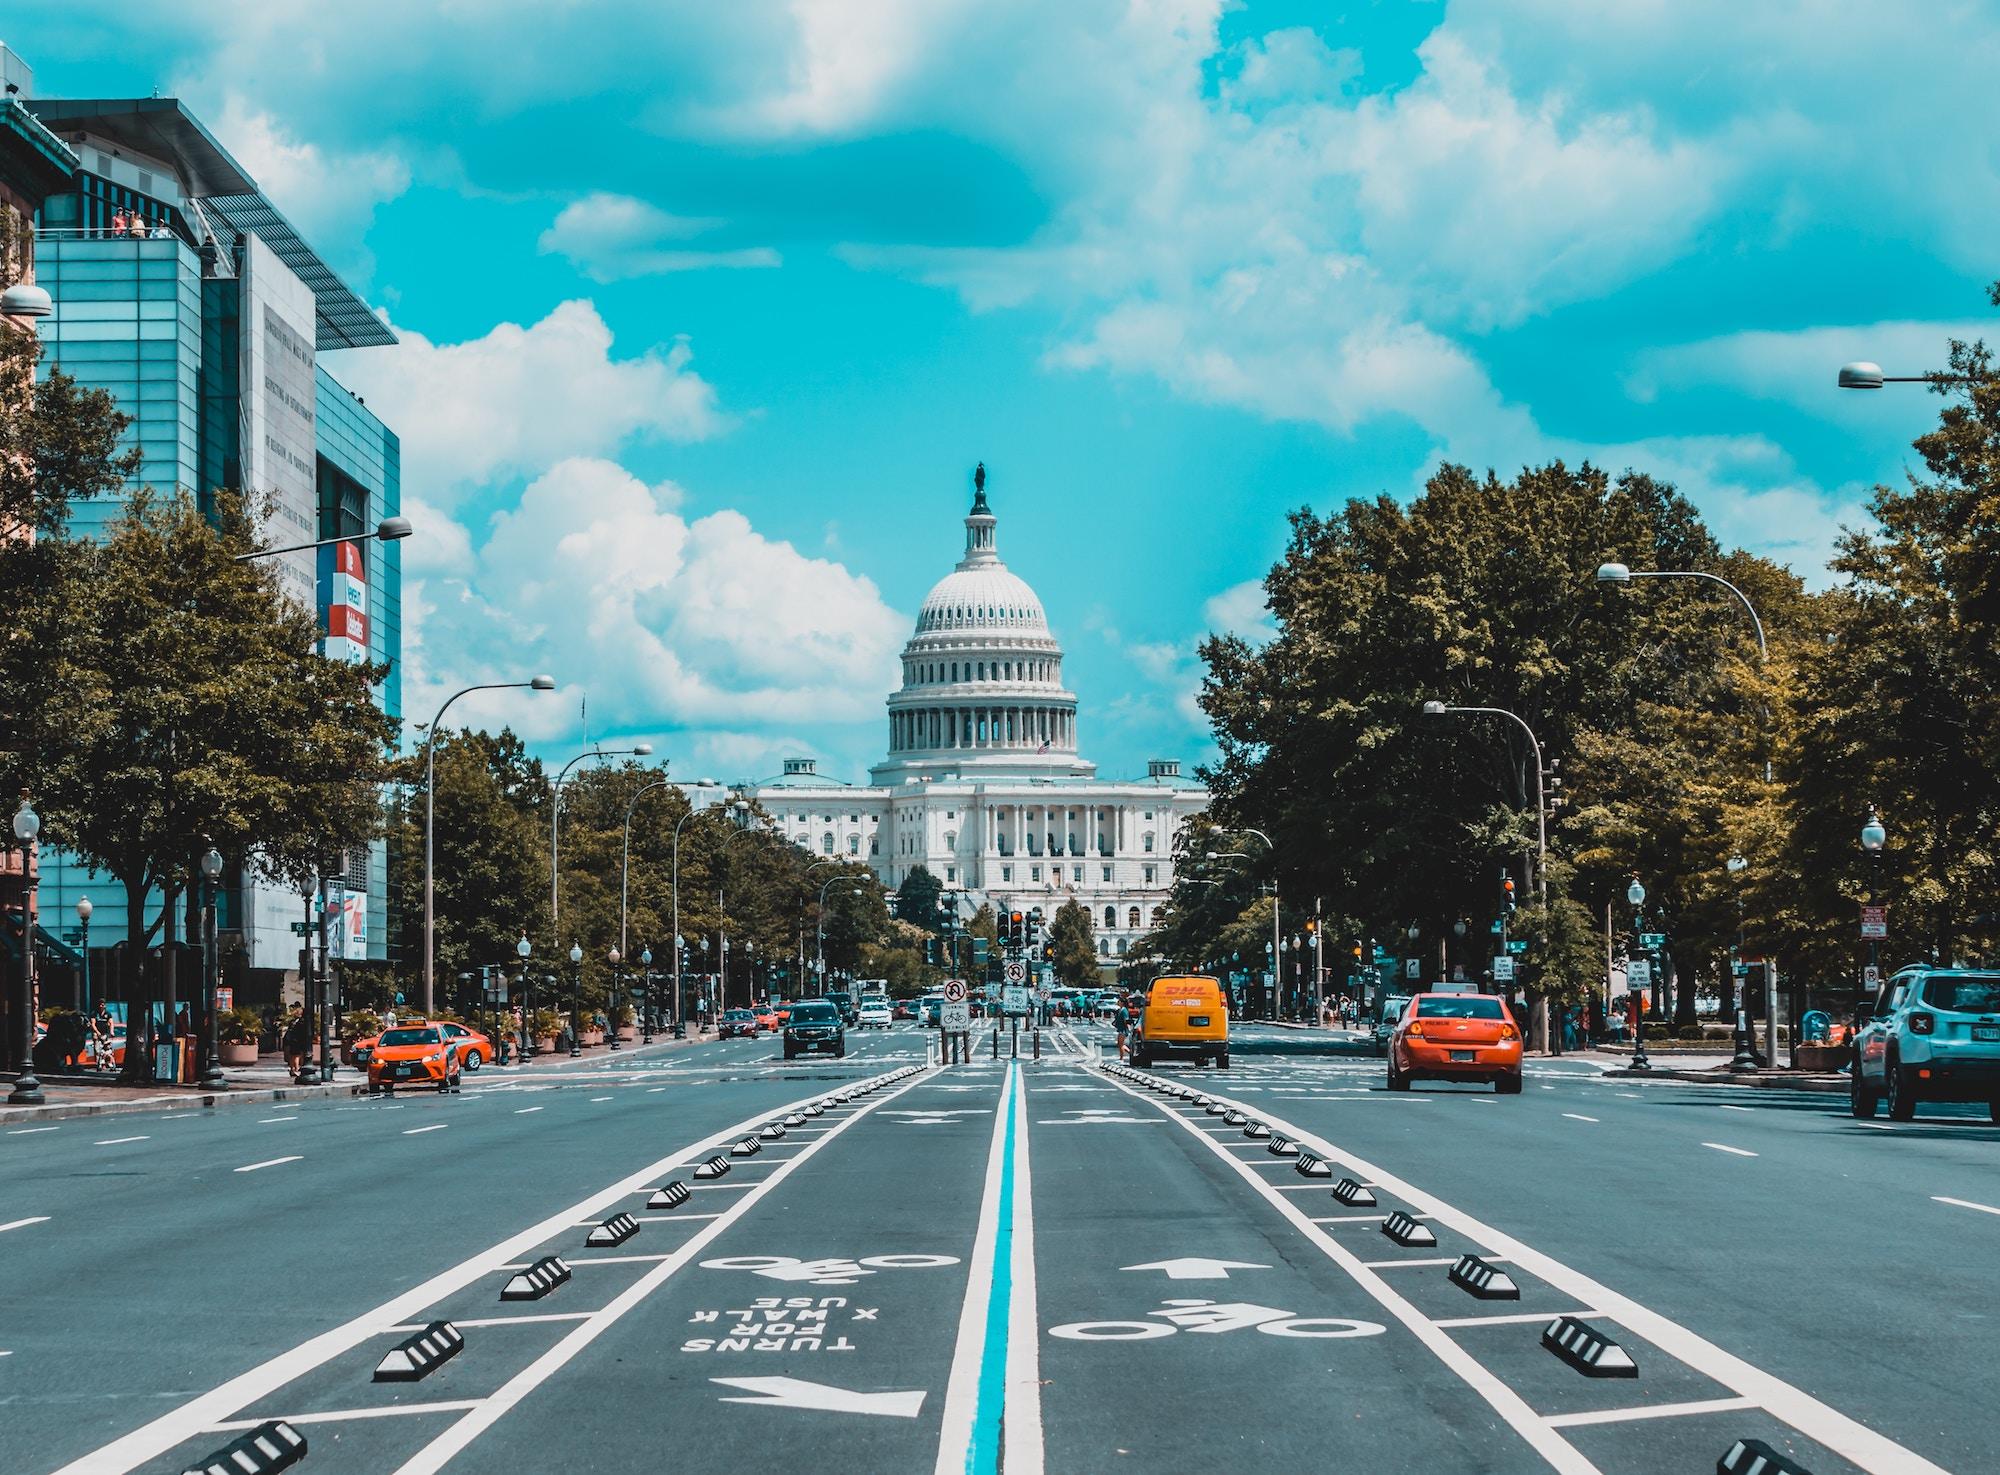 Washington Dc Events Calendar December 2020 Washington DC 2019 Event Calendar: The Best Things to Do This Month